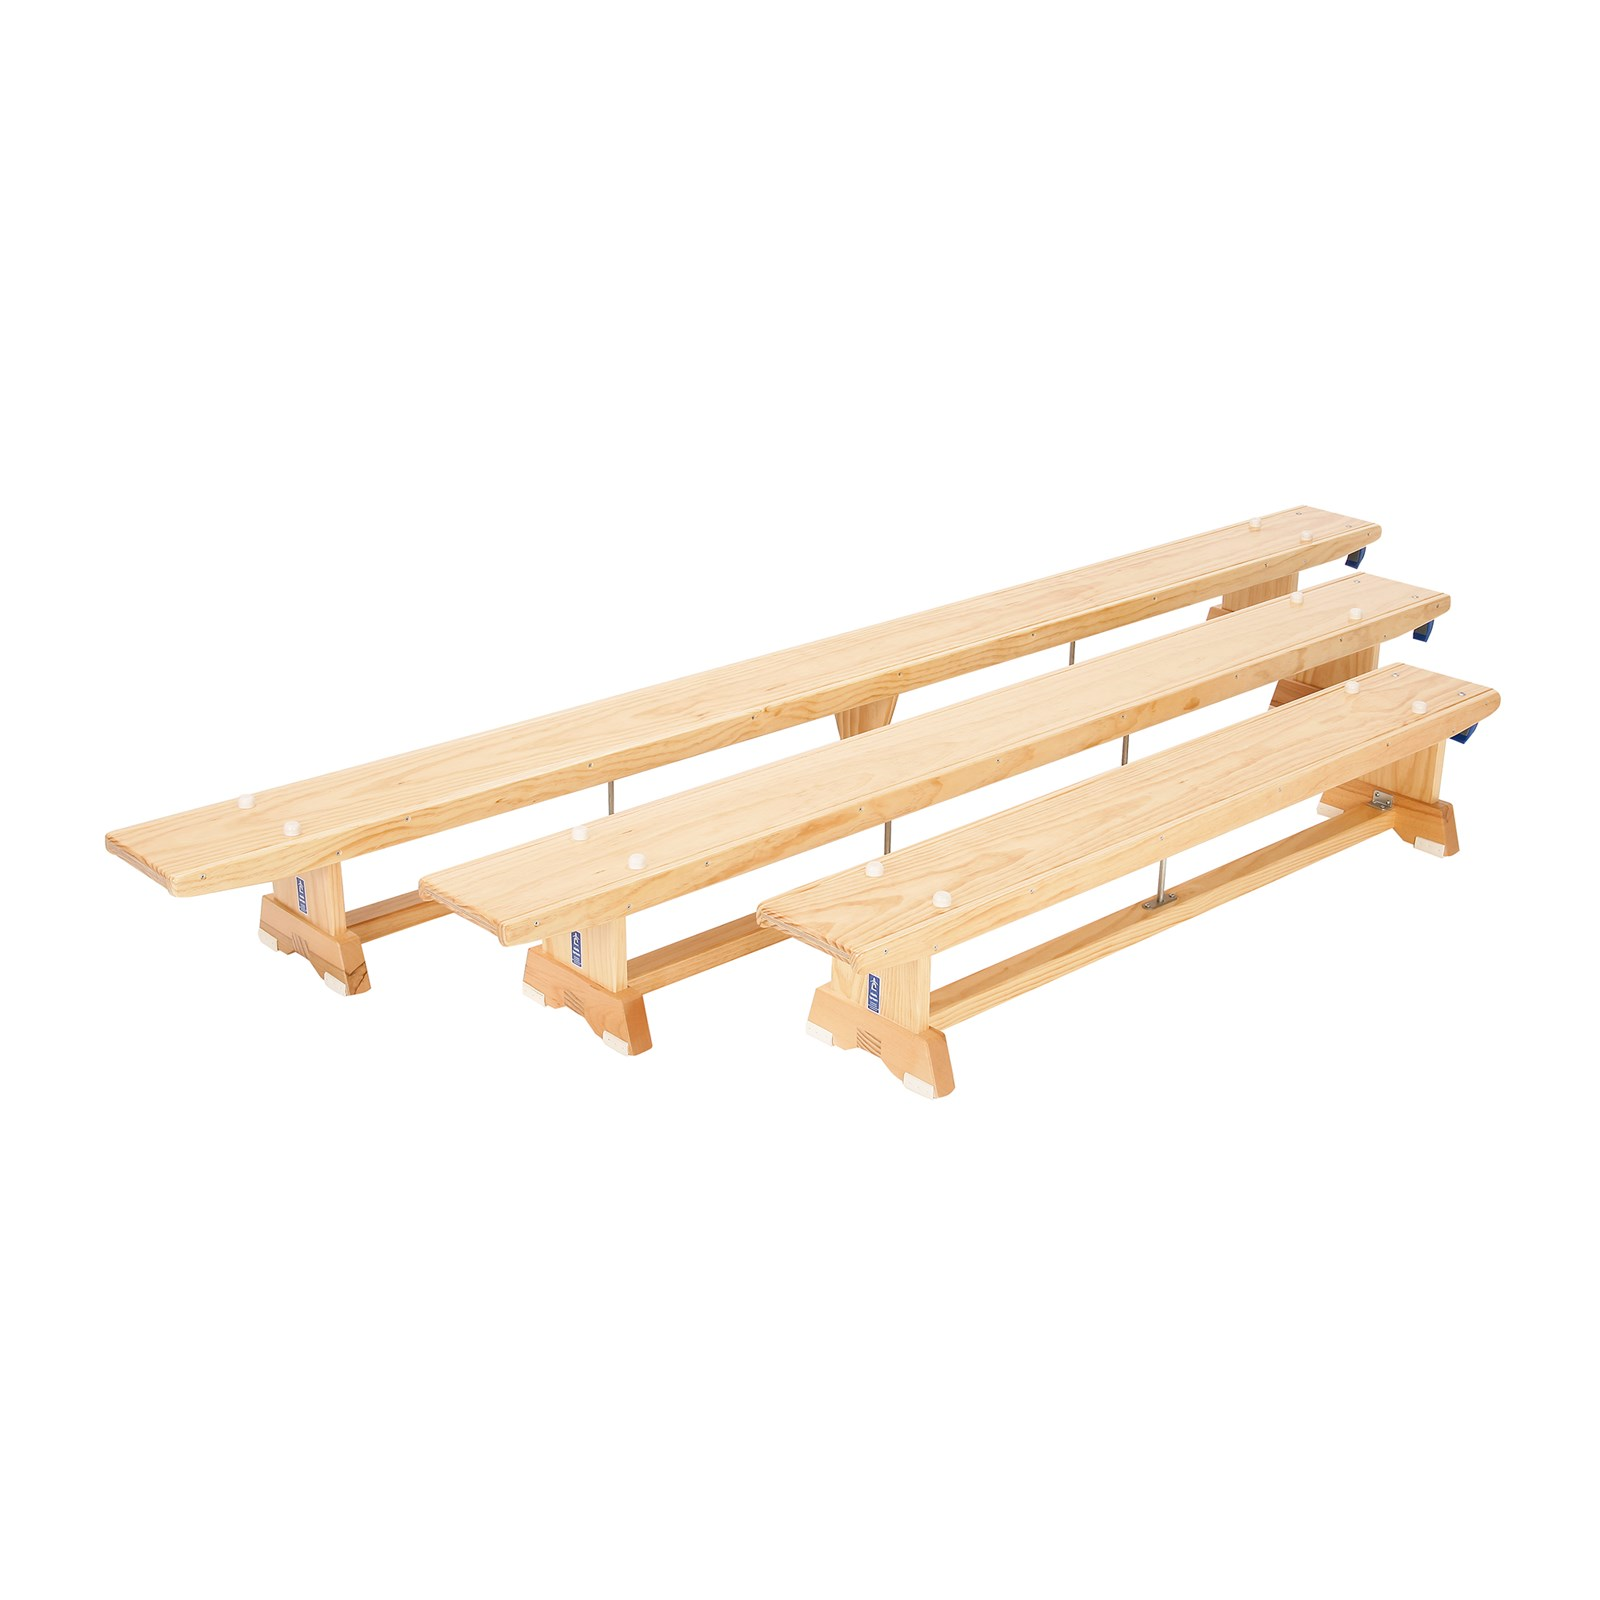 Balance Bench - 2.70m - Hooks One End